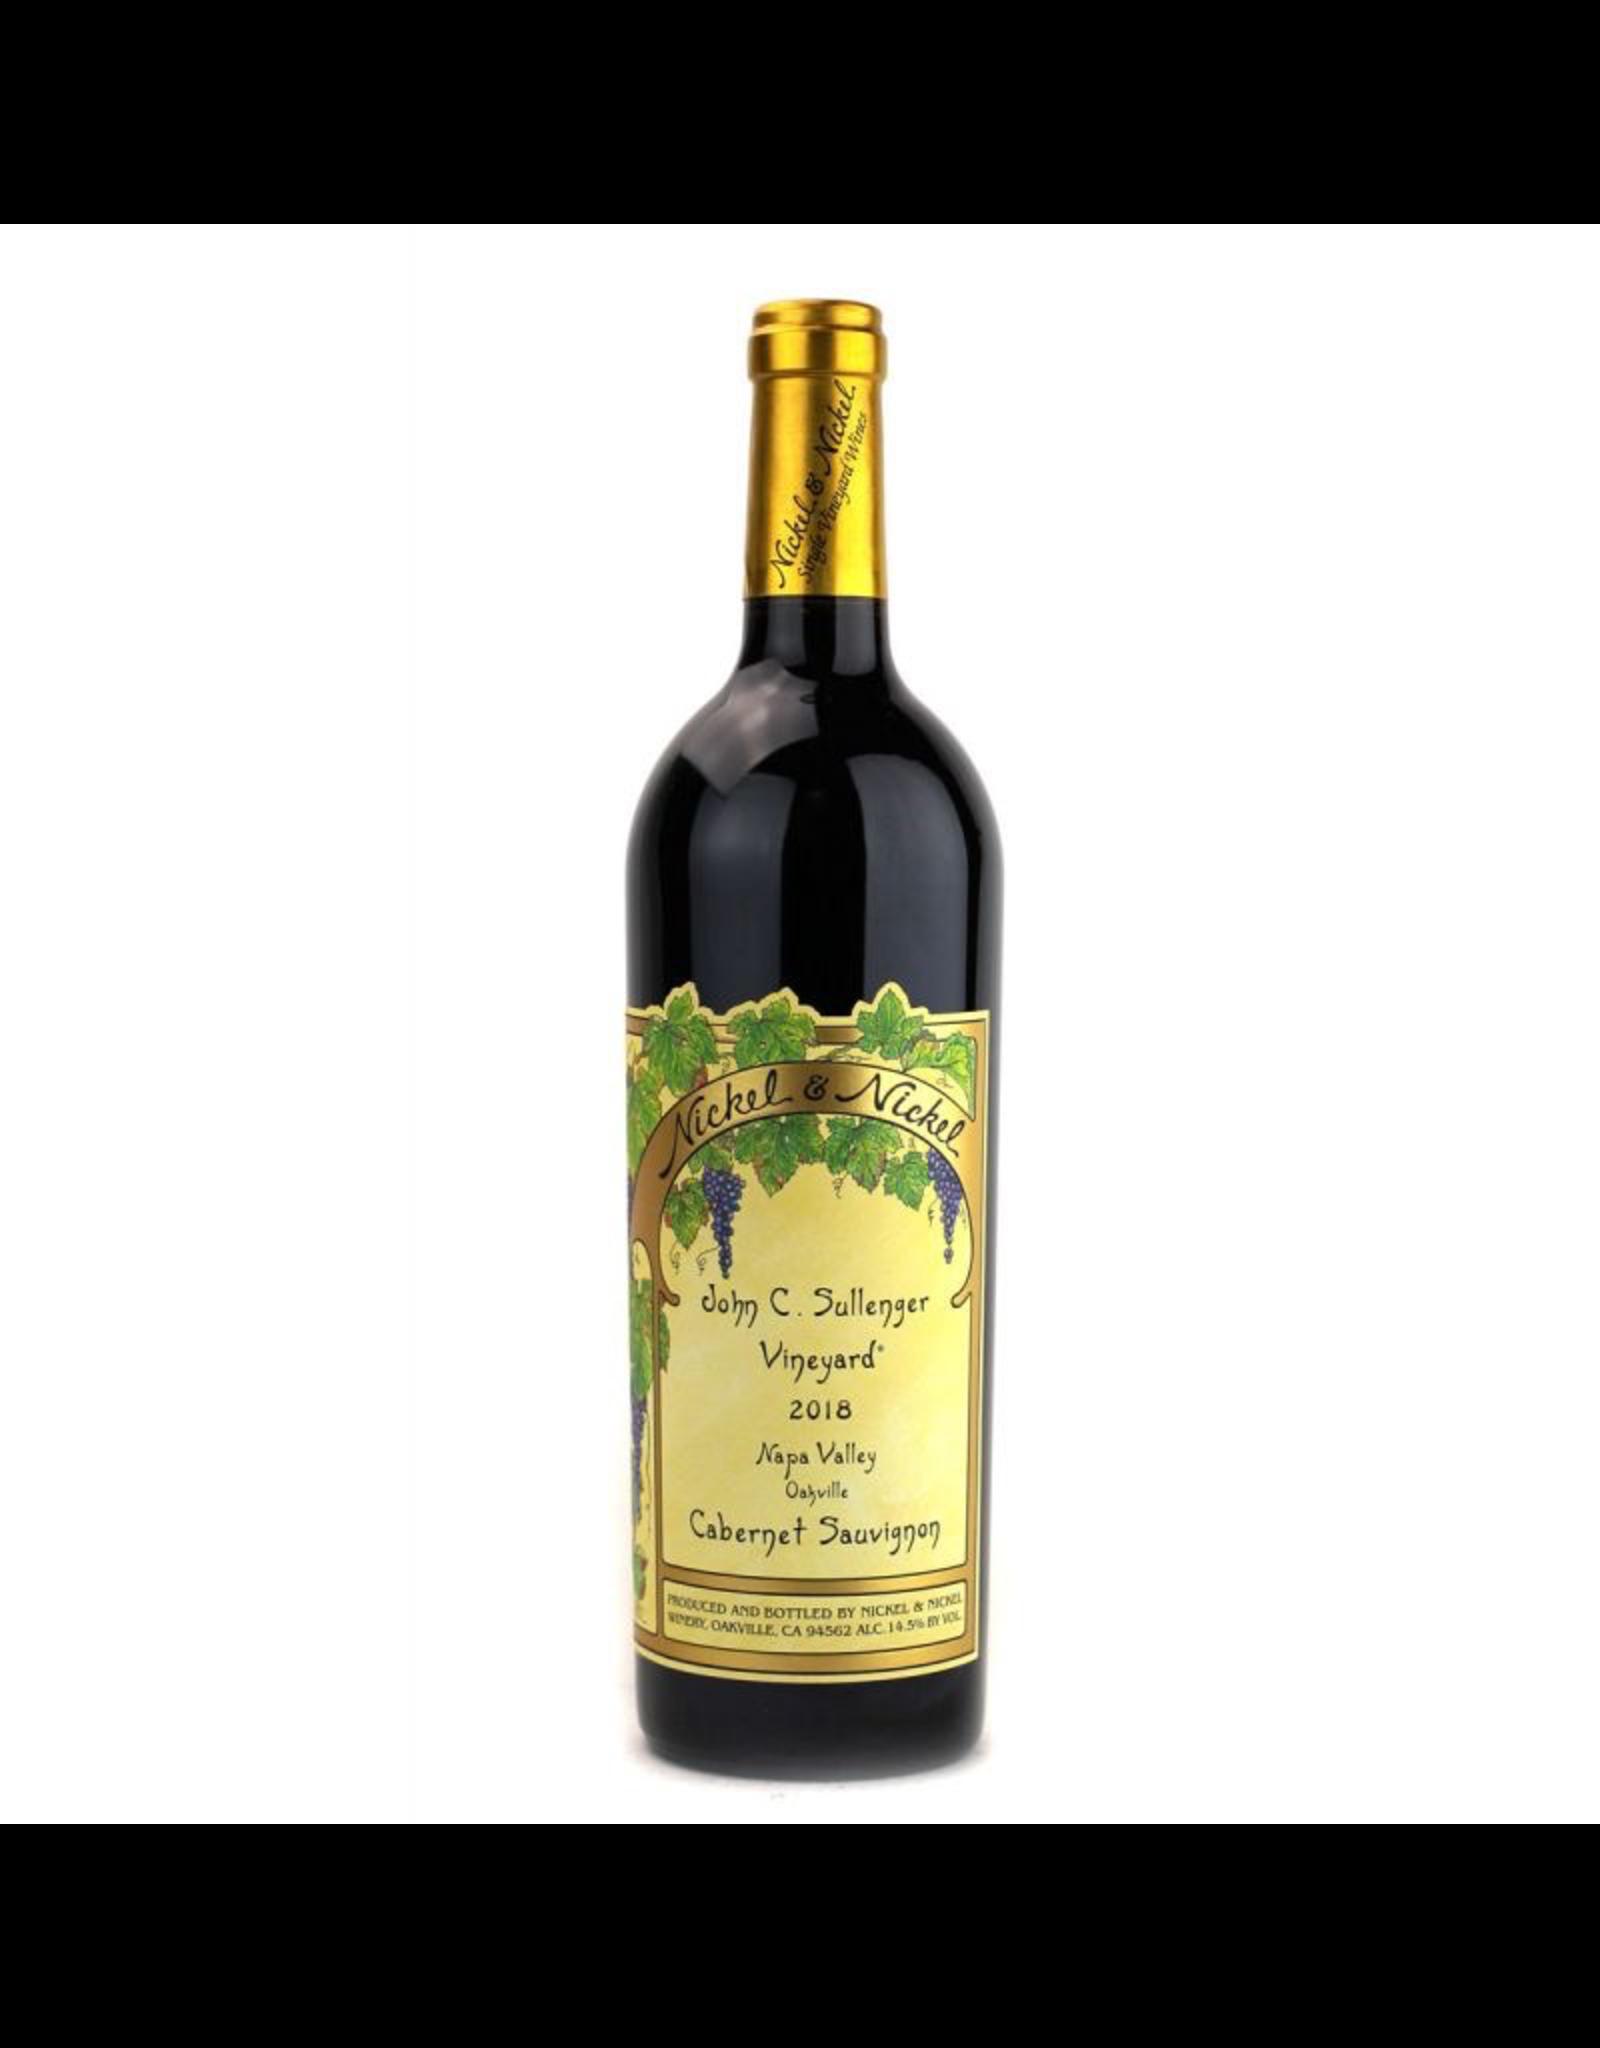 Red Wine 2018, Nickel & Nickel John C. Sullenger, Cabernet Sauvignon, Oakville, Napa Valley, California, 14.3% Alc, CT98.5